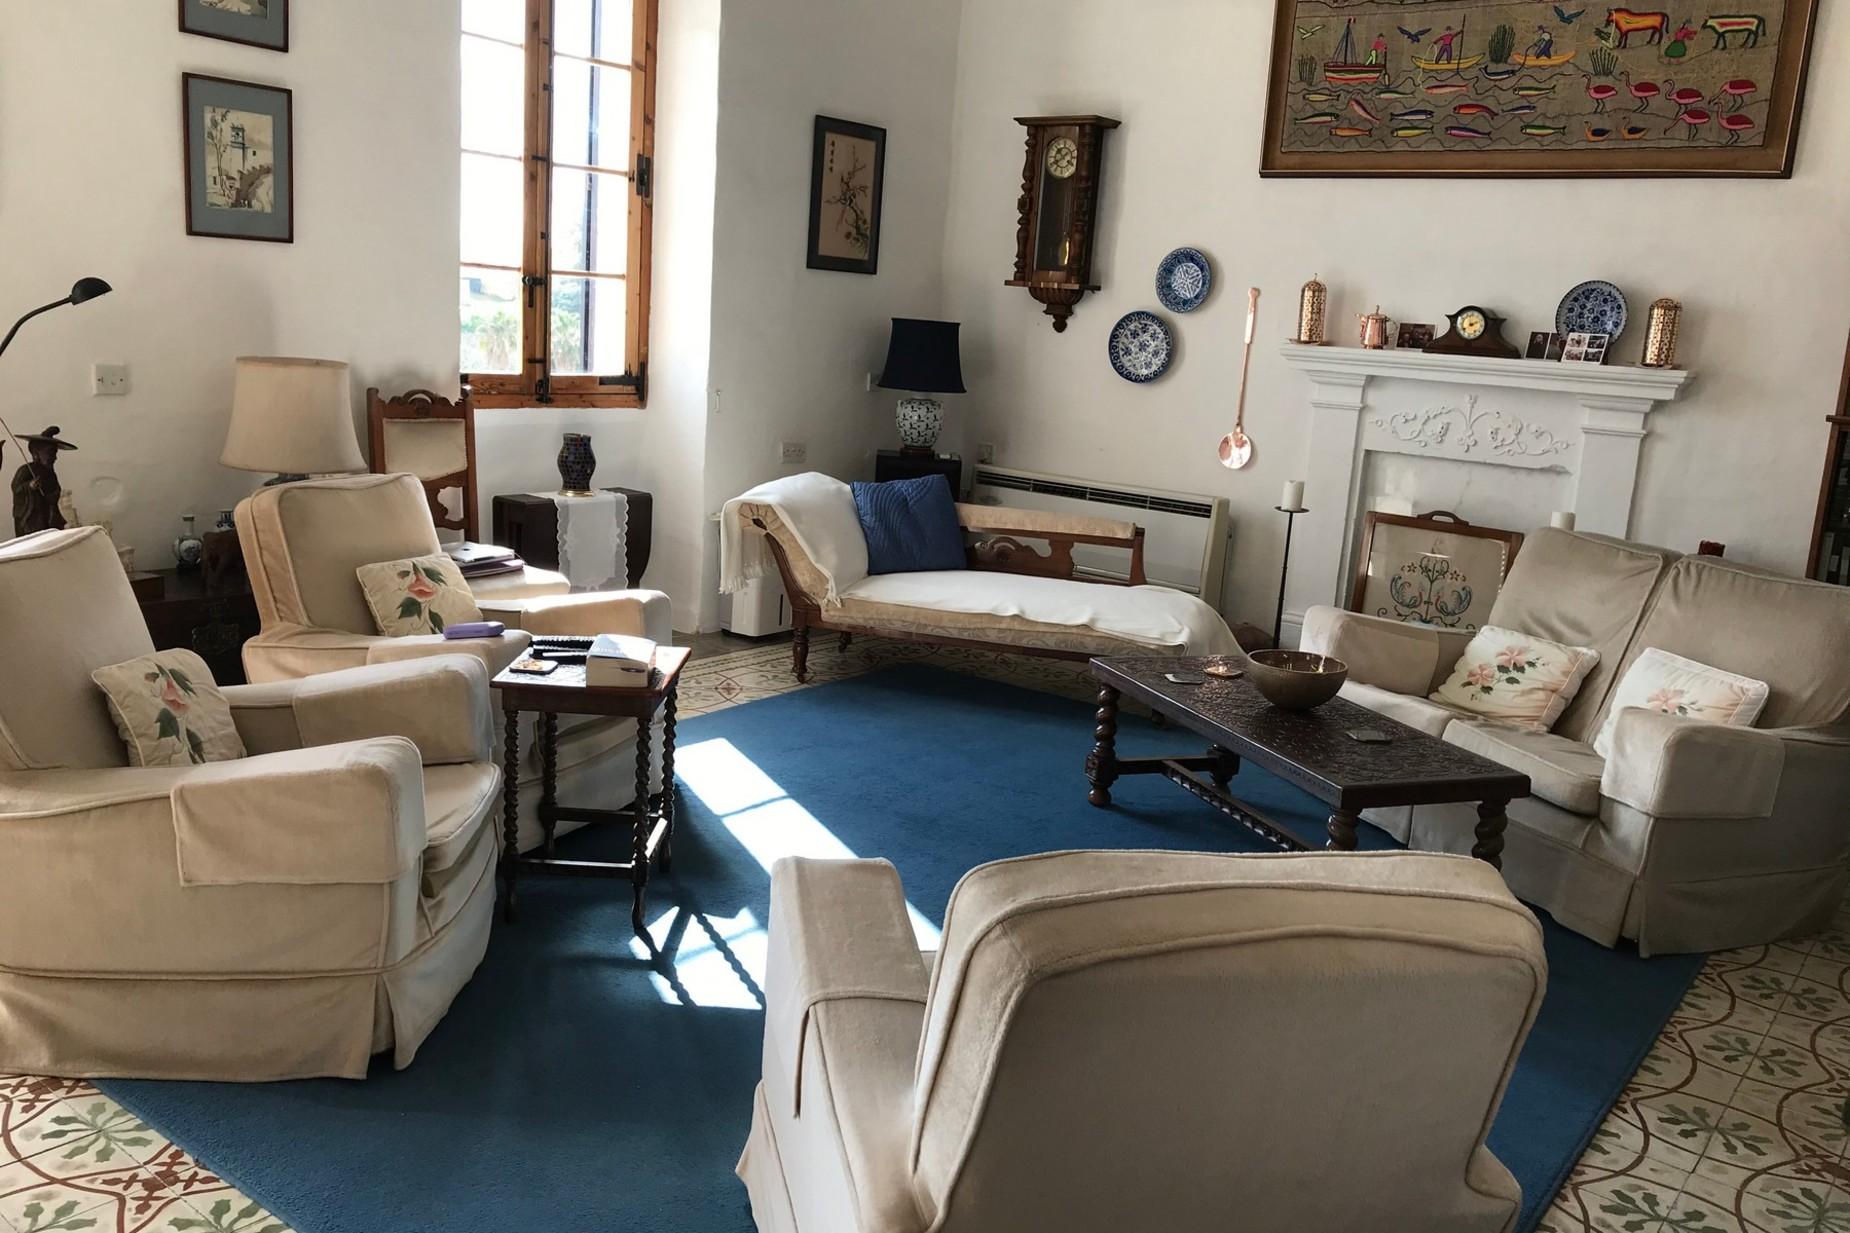 6 bed Town House For Sale in Birzebbugia, Birzebbugia - thumb 9